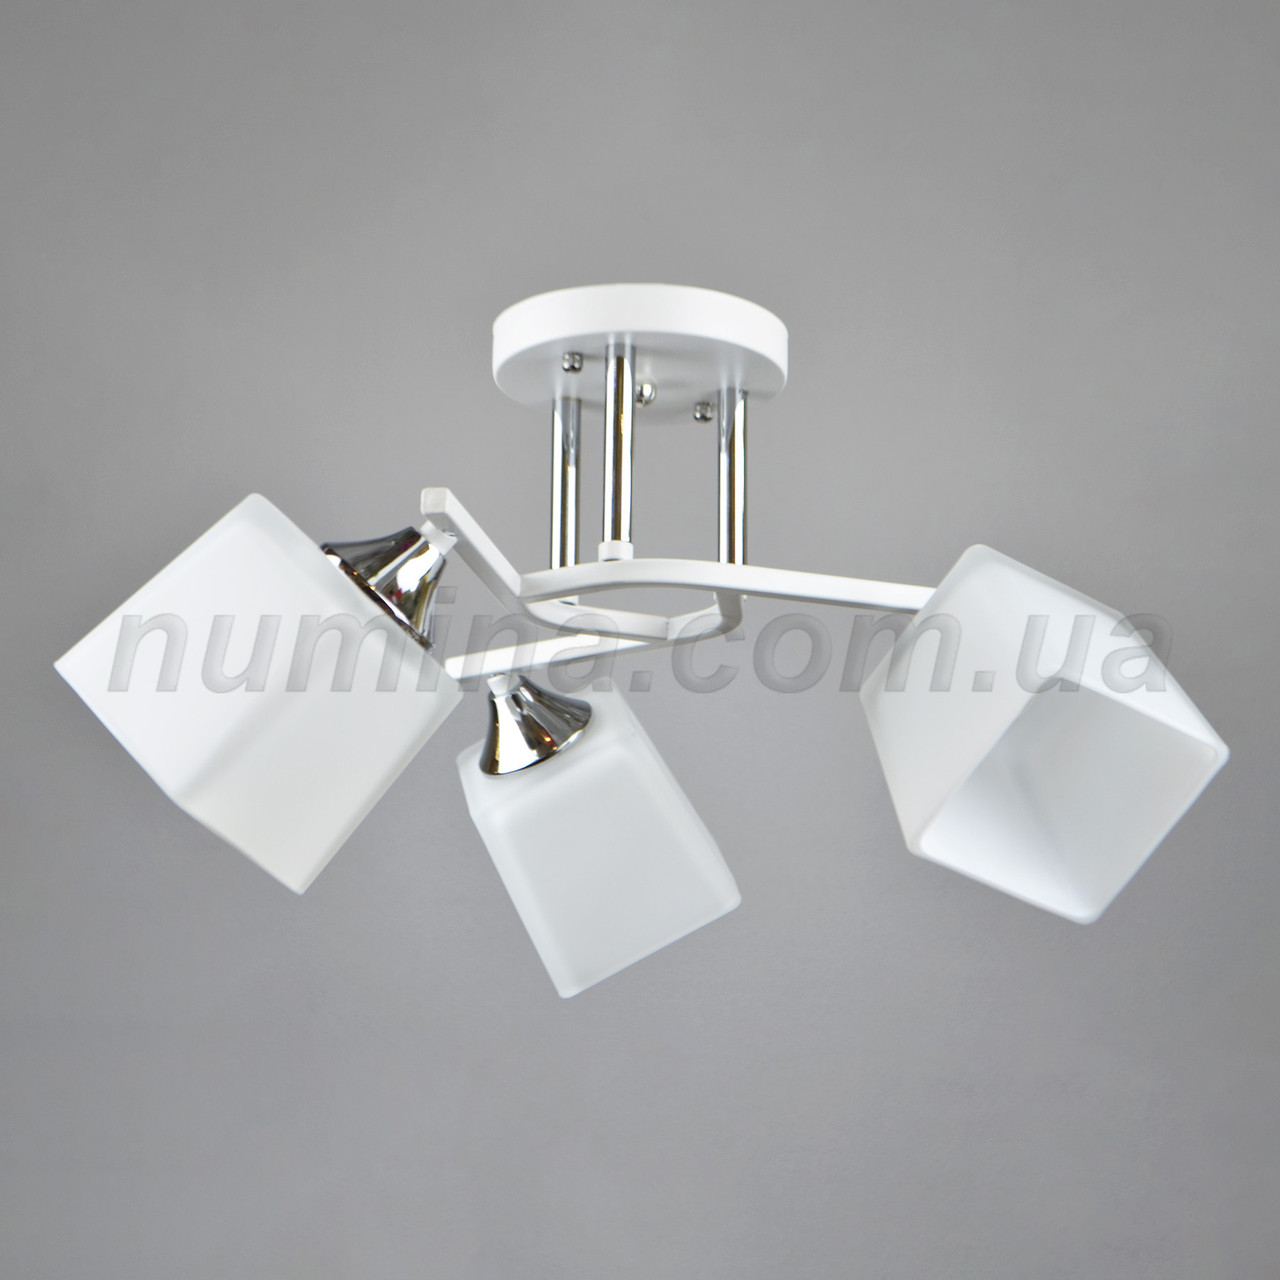 Люстра потолочная на три квадратных белых плафона 3-A3064/3 WT+CH